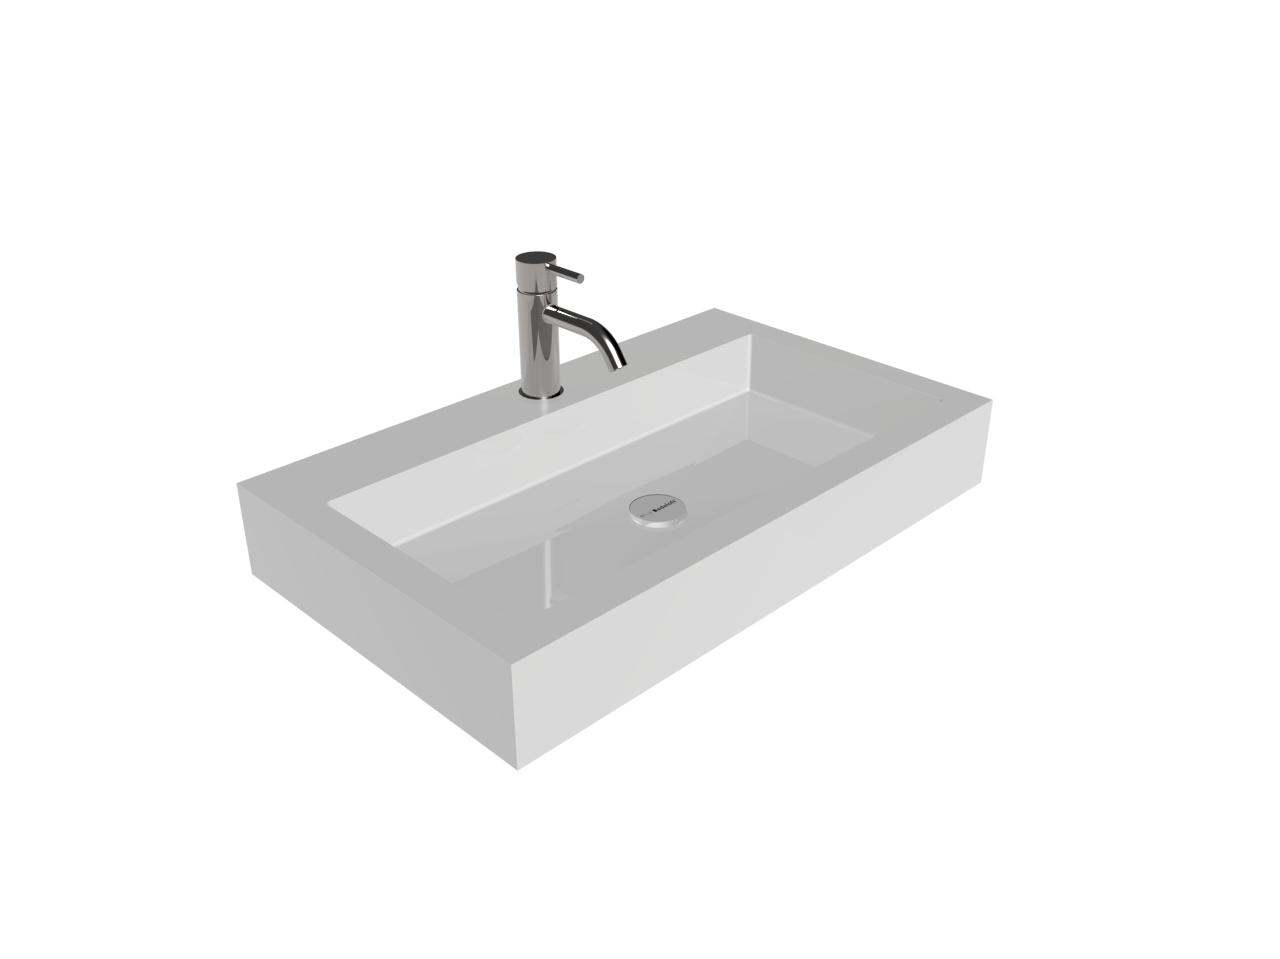 Countertop Sink Model Wb 05 L Badeloft Usa